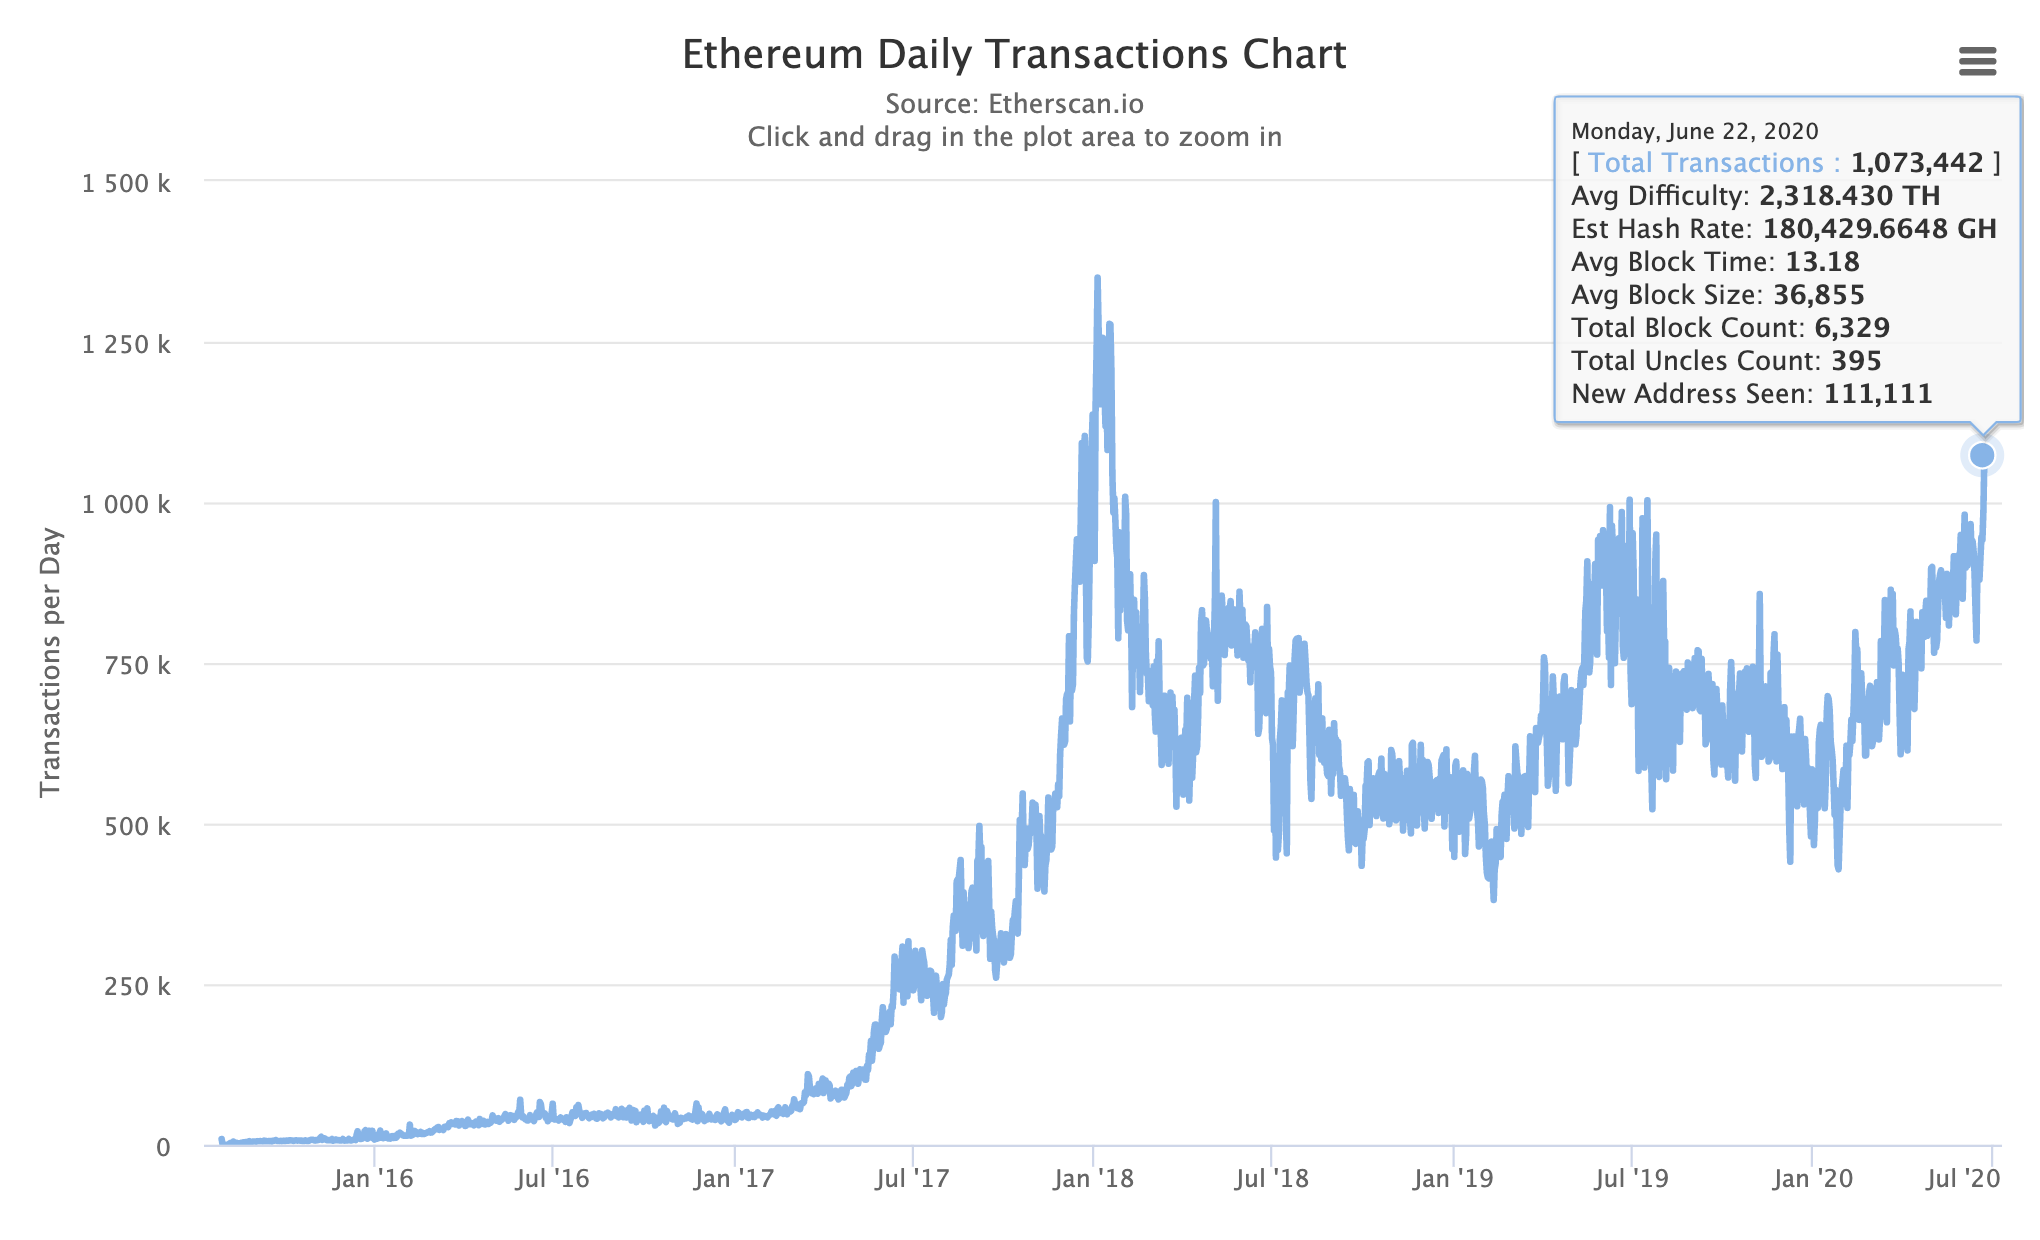 Ethereum transactions surpass one million a day, June 2020